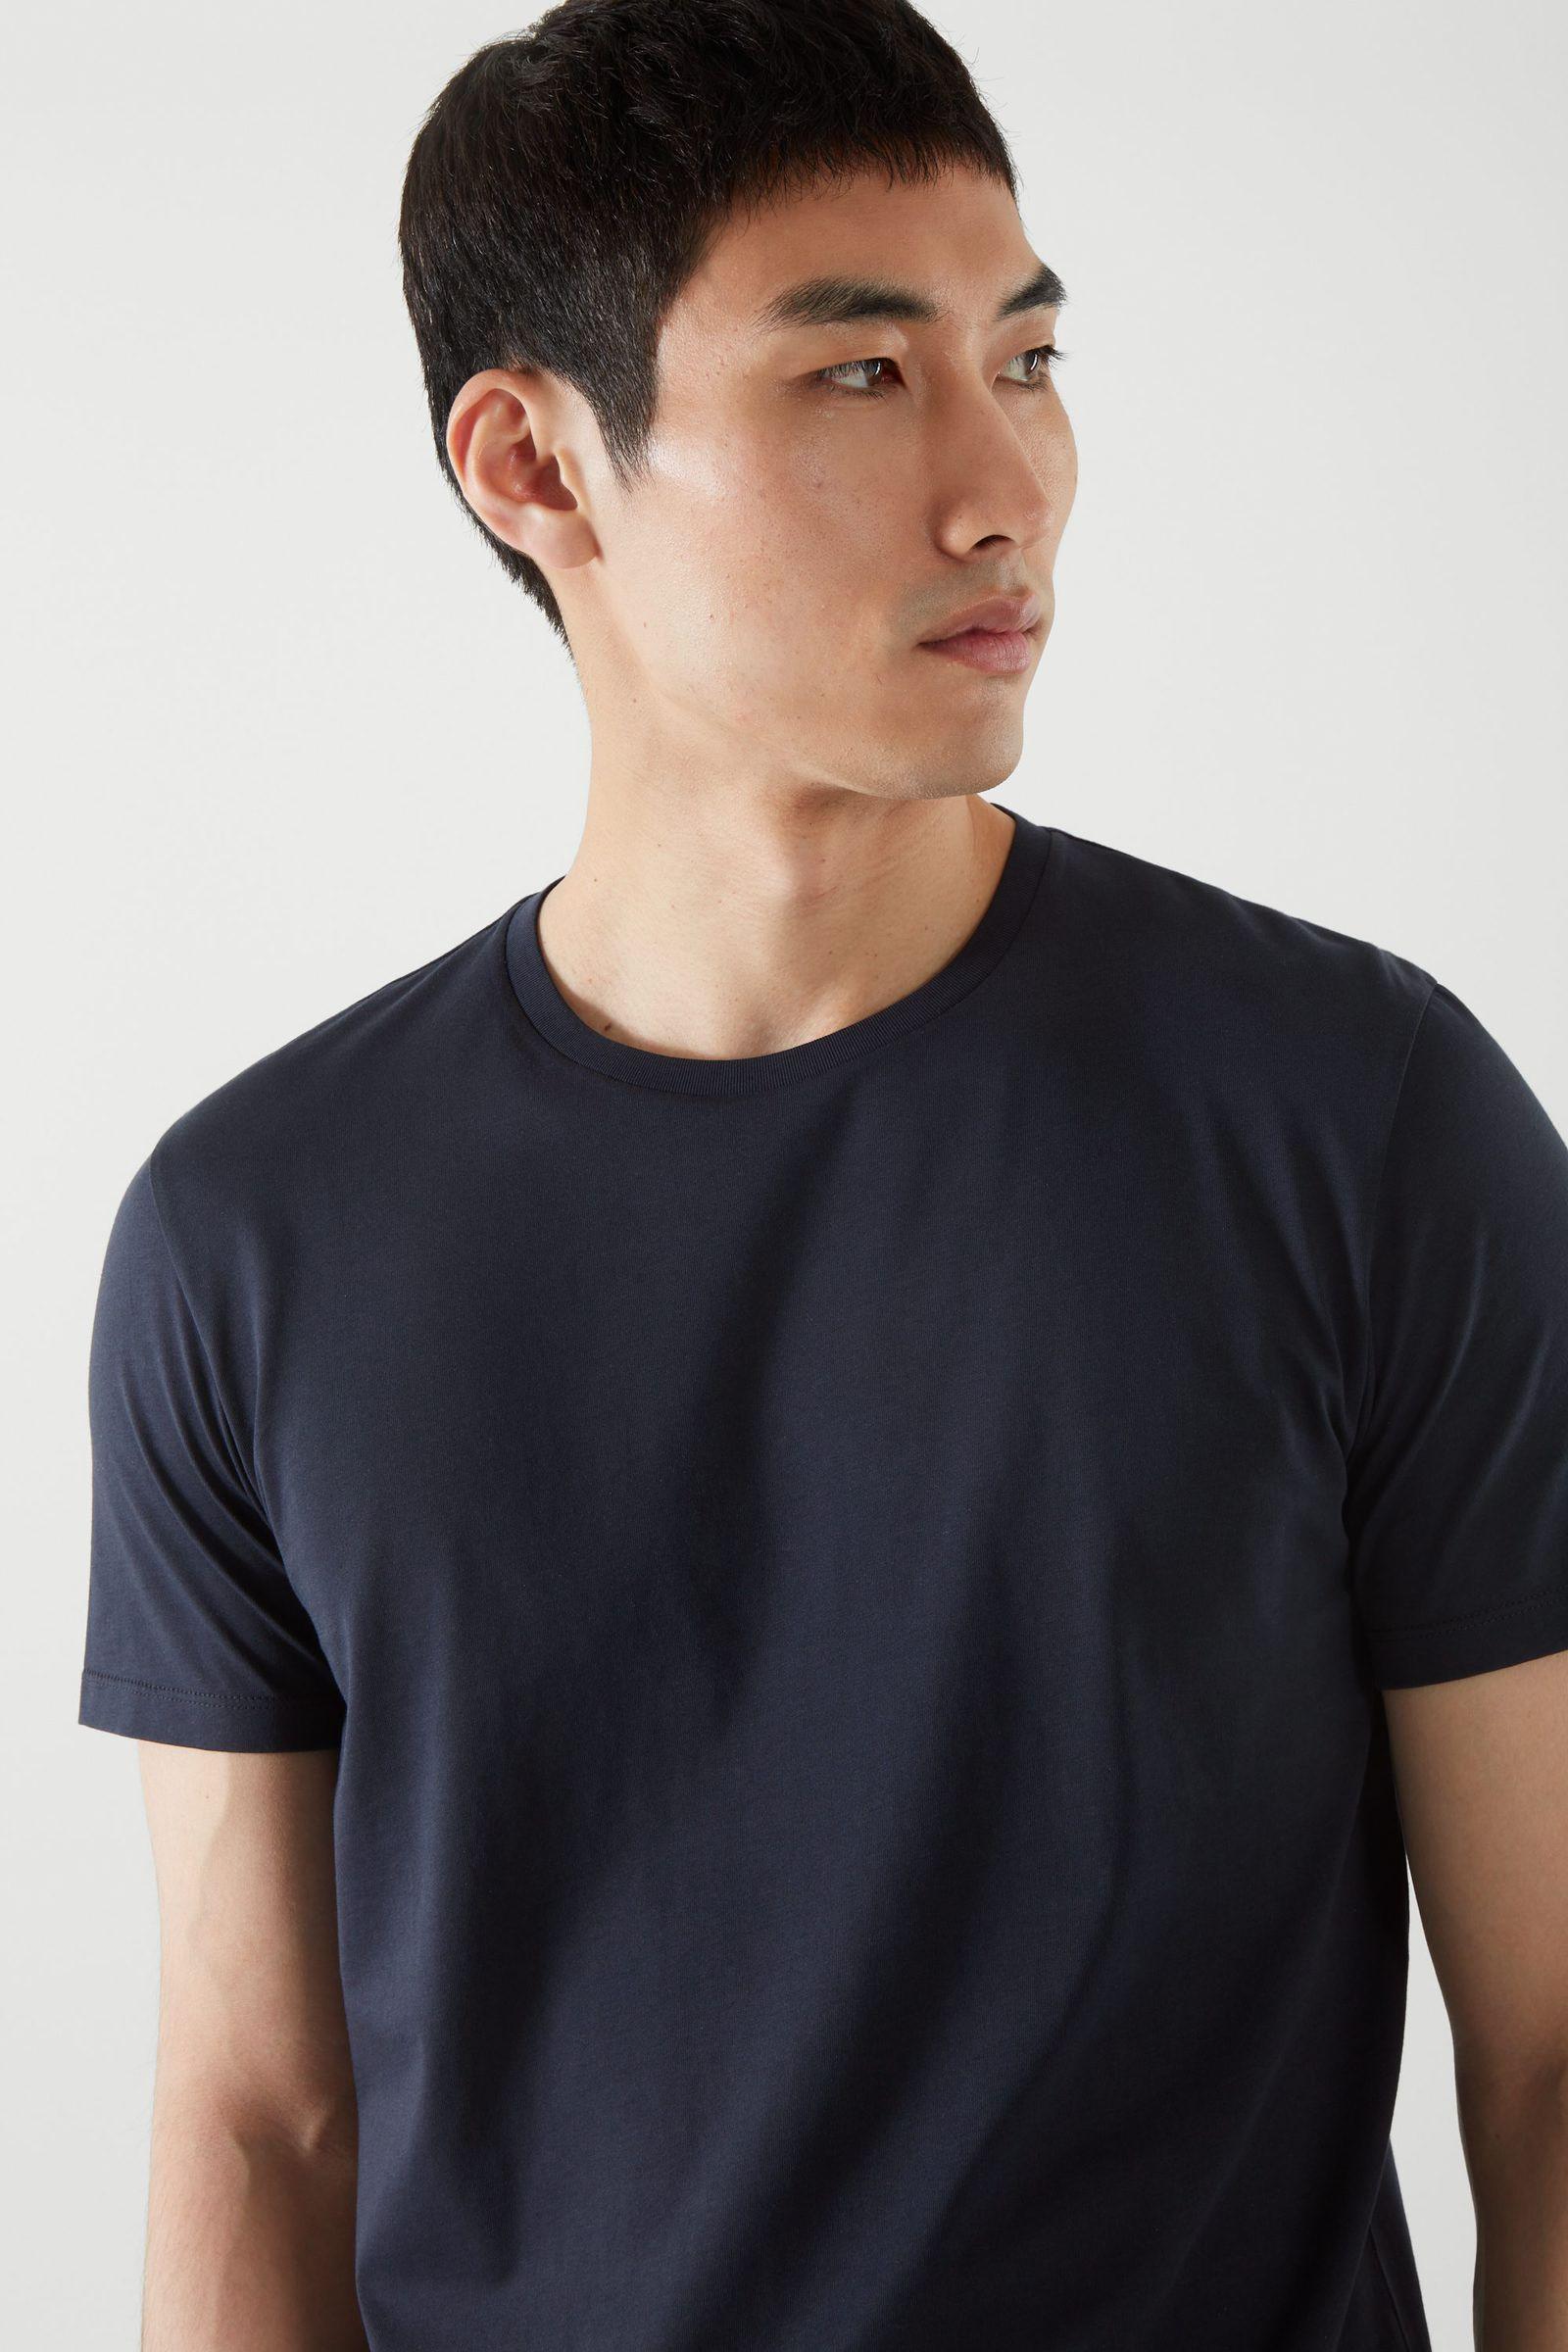 COS 라운드 넥 티셔츠의 미드나이트 블루컬러 ECOMLook입니다.